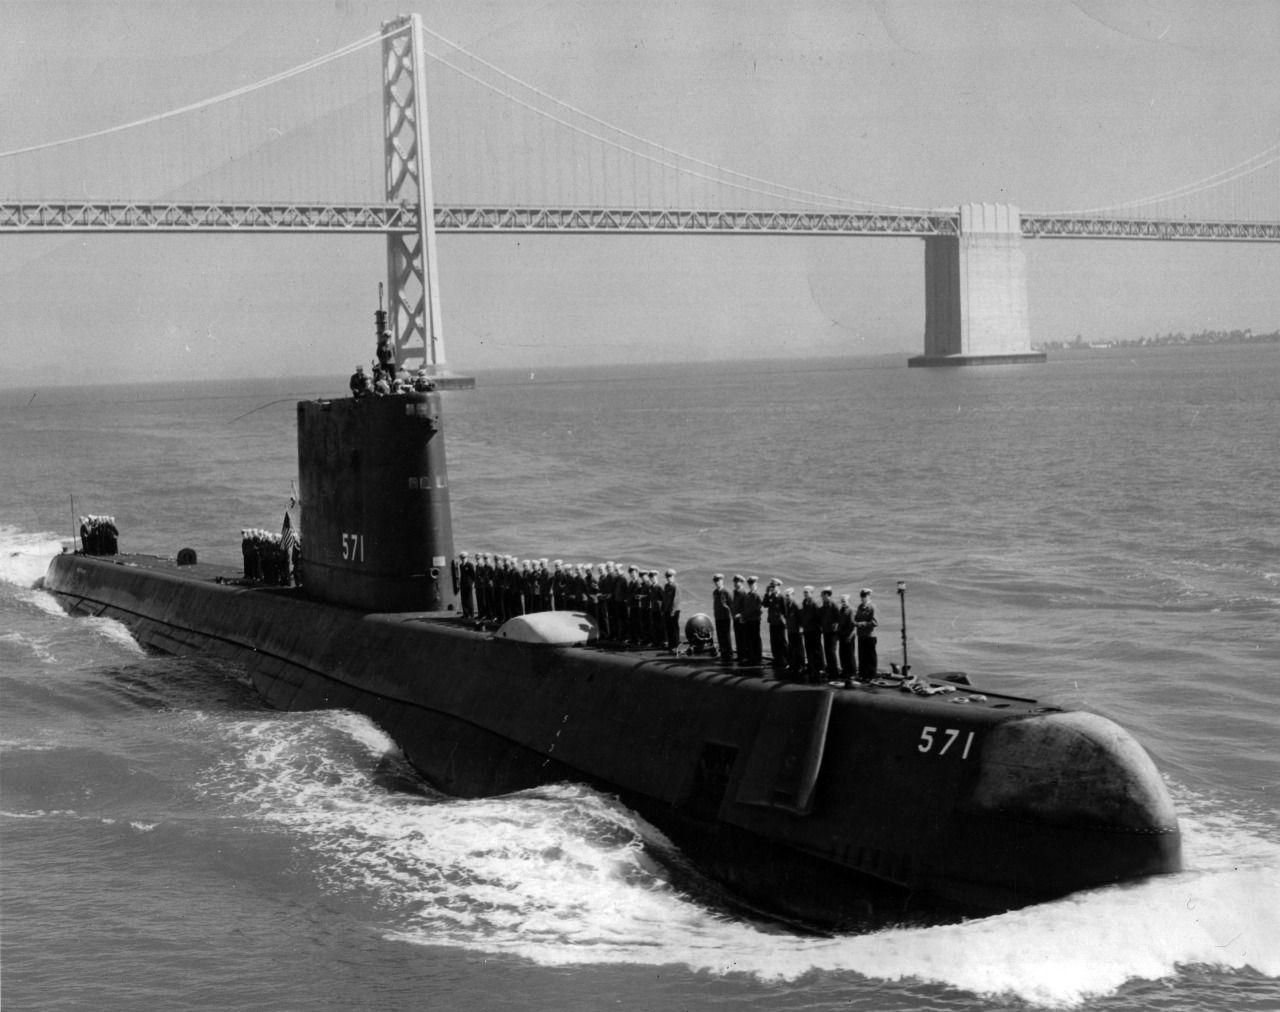 uss nautilus (ssn-571) in san francisco bay, 1958